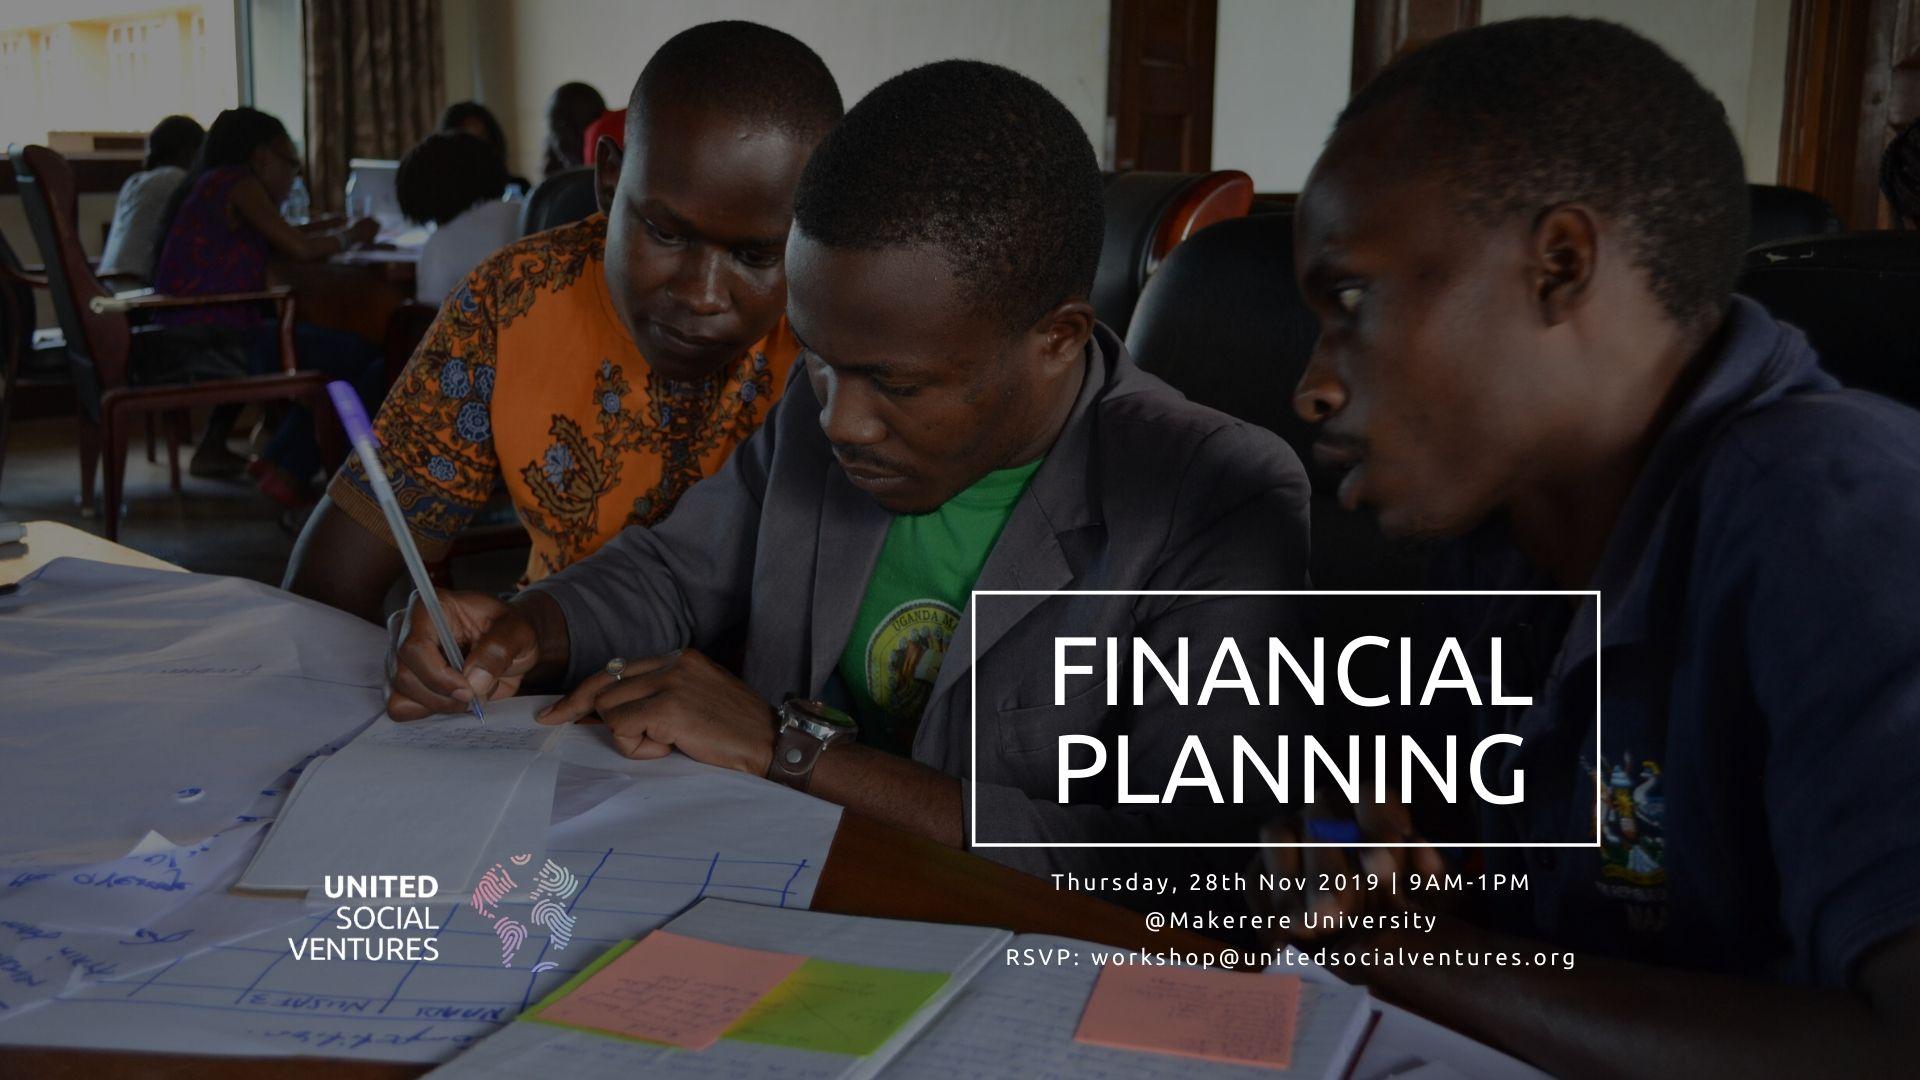 191128 - Financial Planning